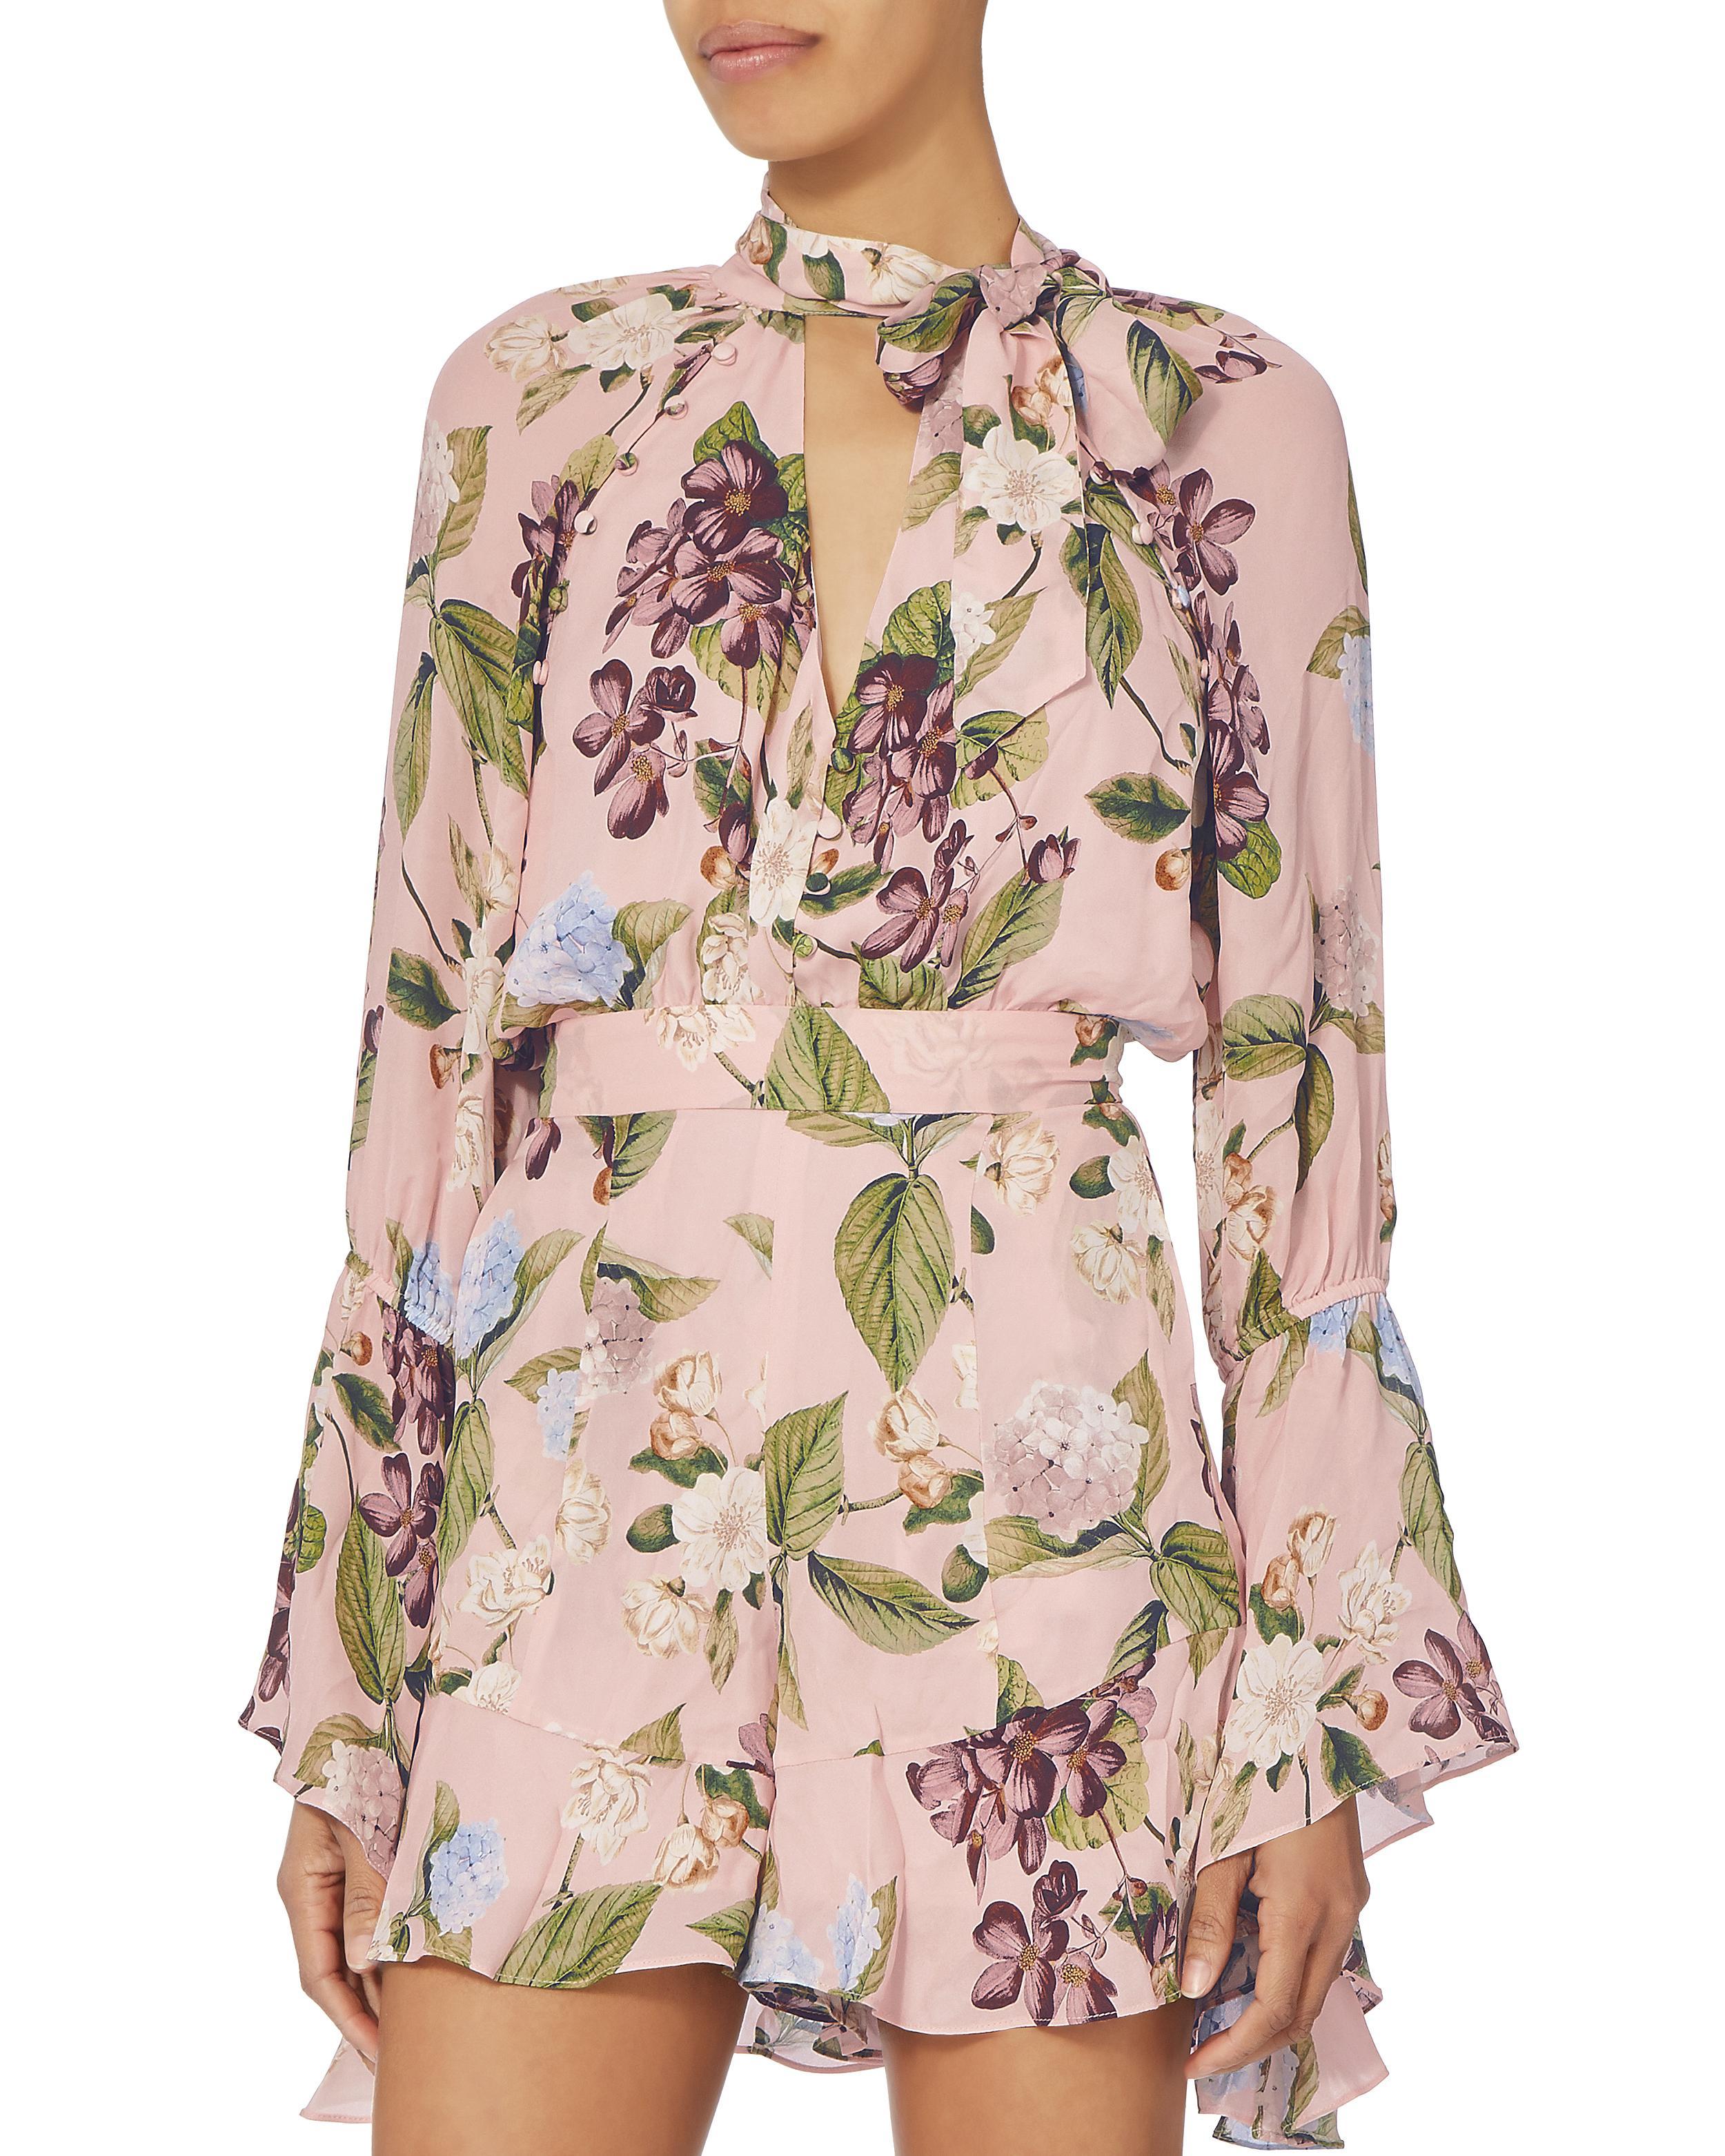 52989fd180eb Lyst - Nicholas Evie Floral Bell Sleeve Romper in Pink